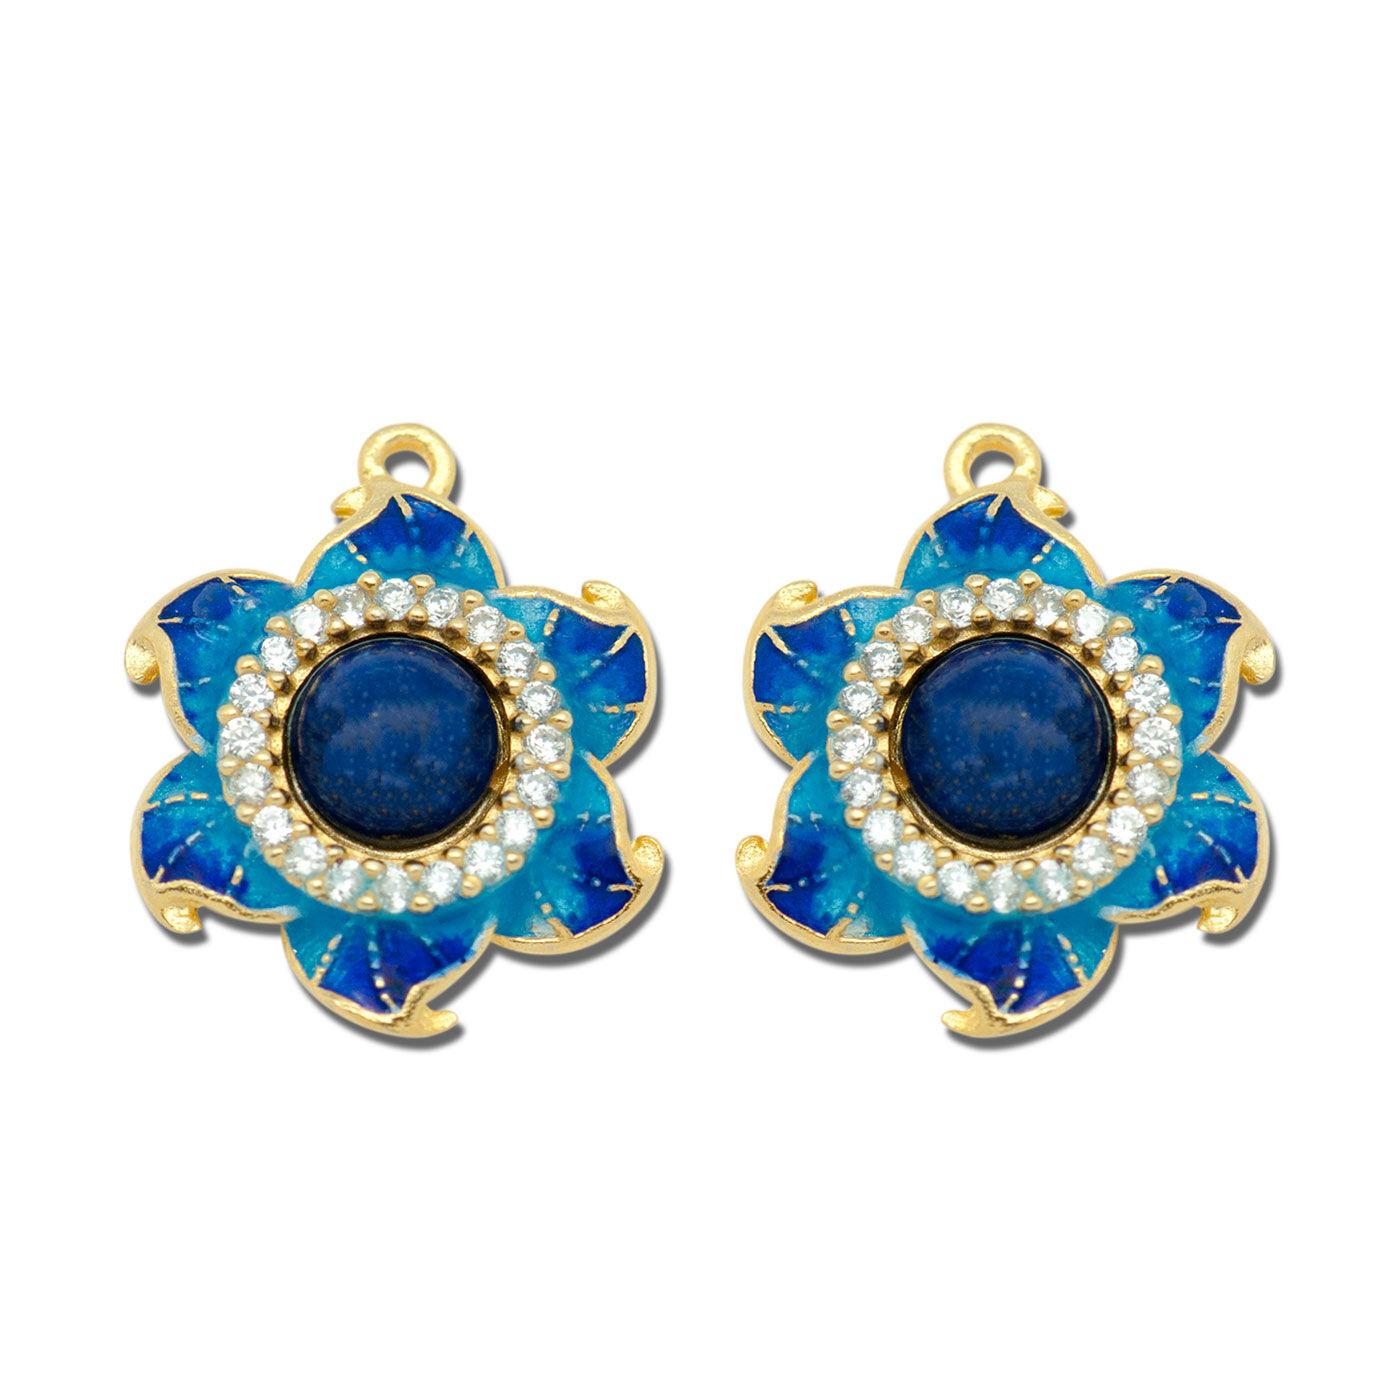 silverbene Handmade Enamel Natural Blue Lapis/Red Agate 925 Sterling Silver Studs Earrings